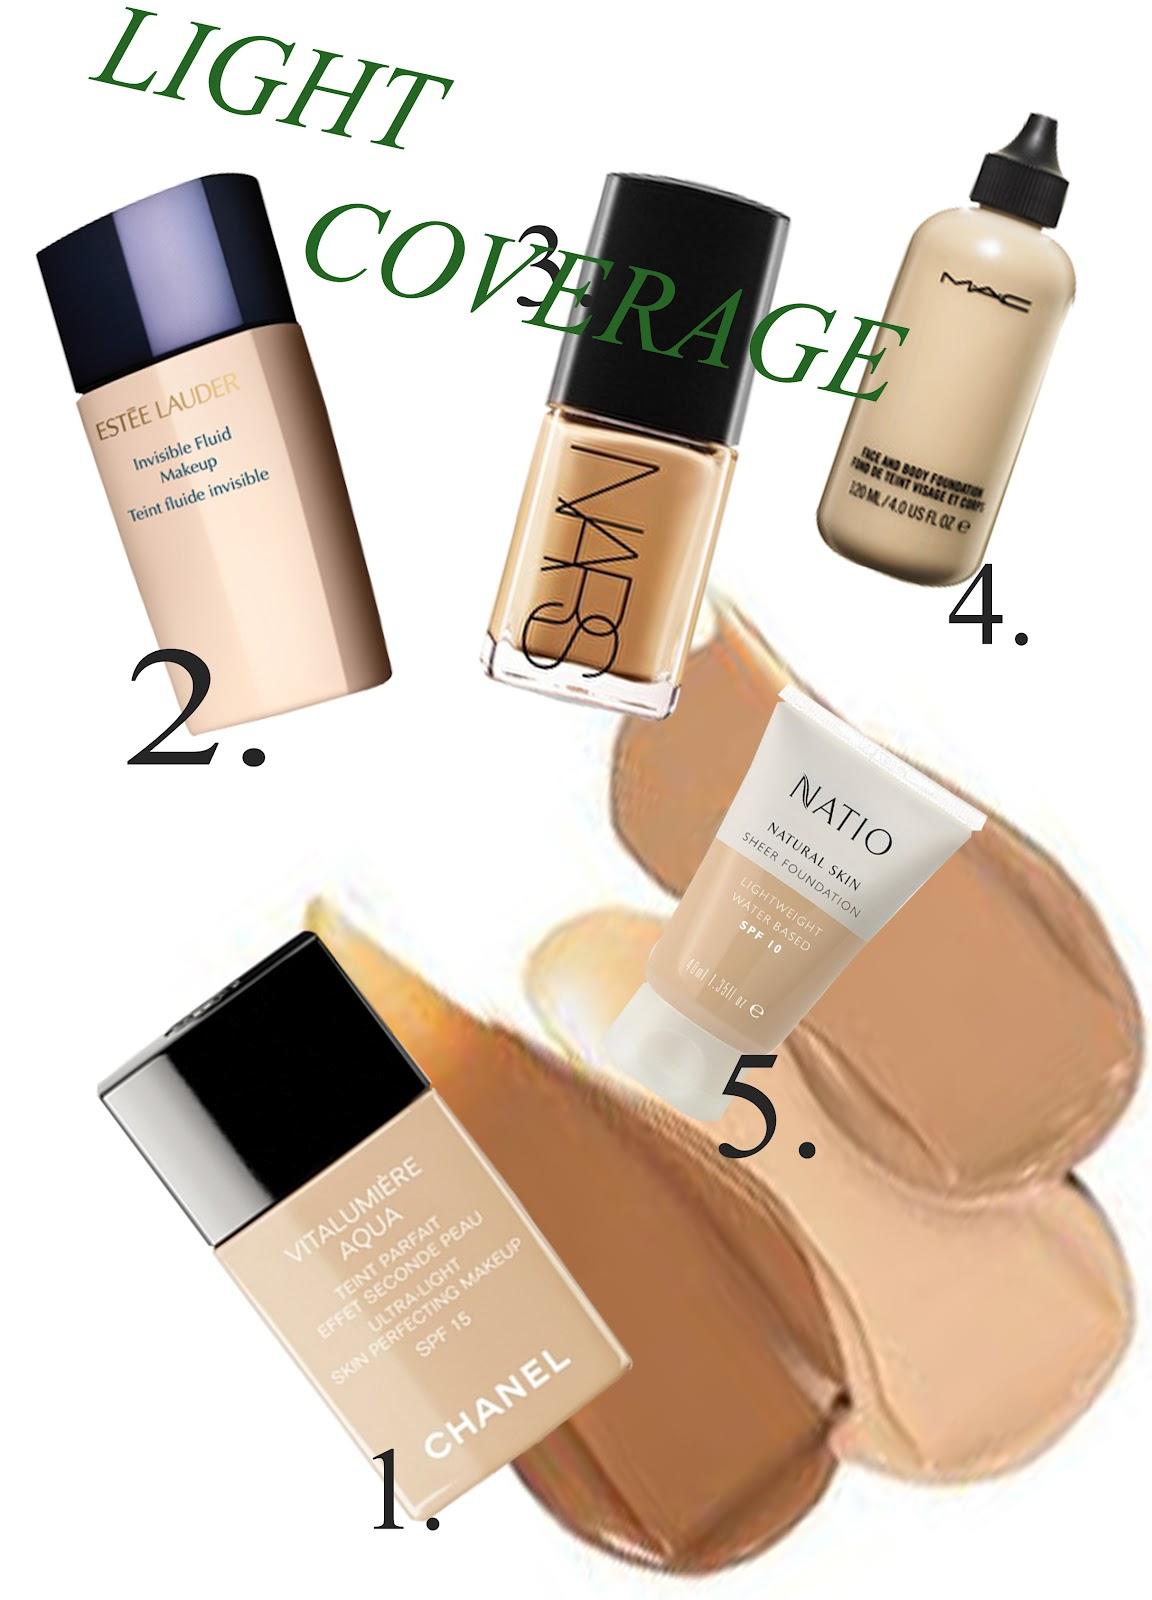 Beauté Gazette A Foundation Guide For All Skin Types